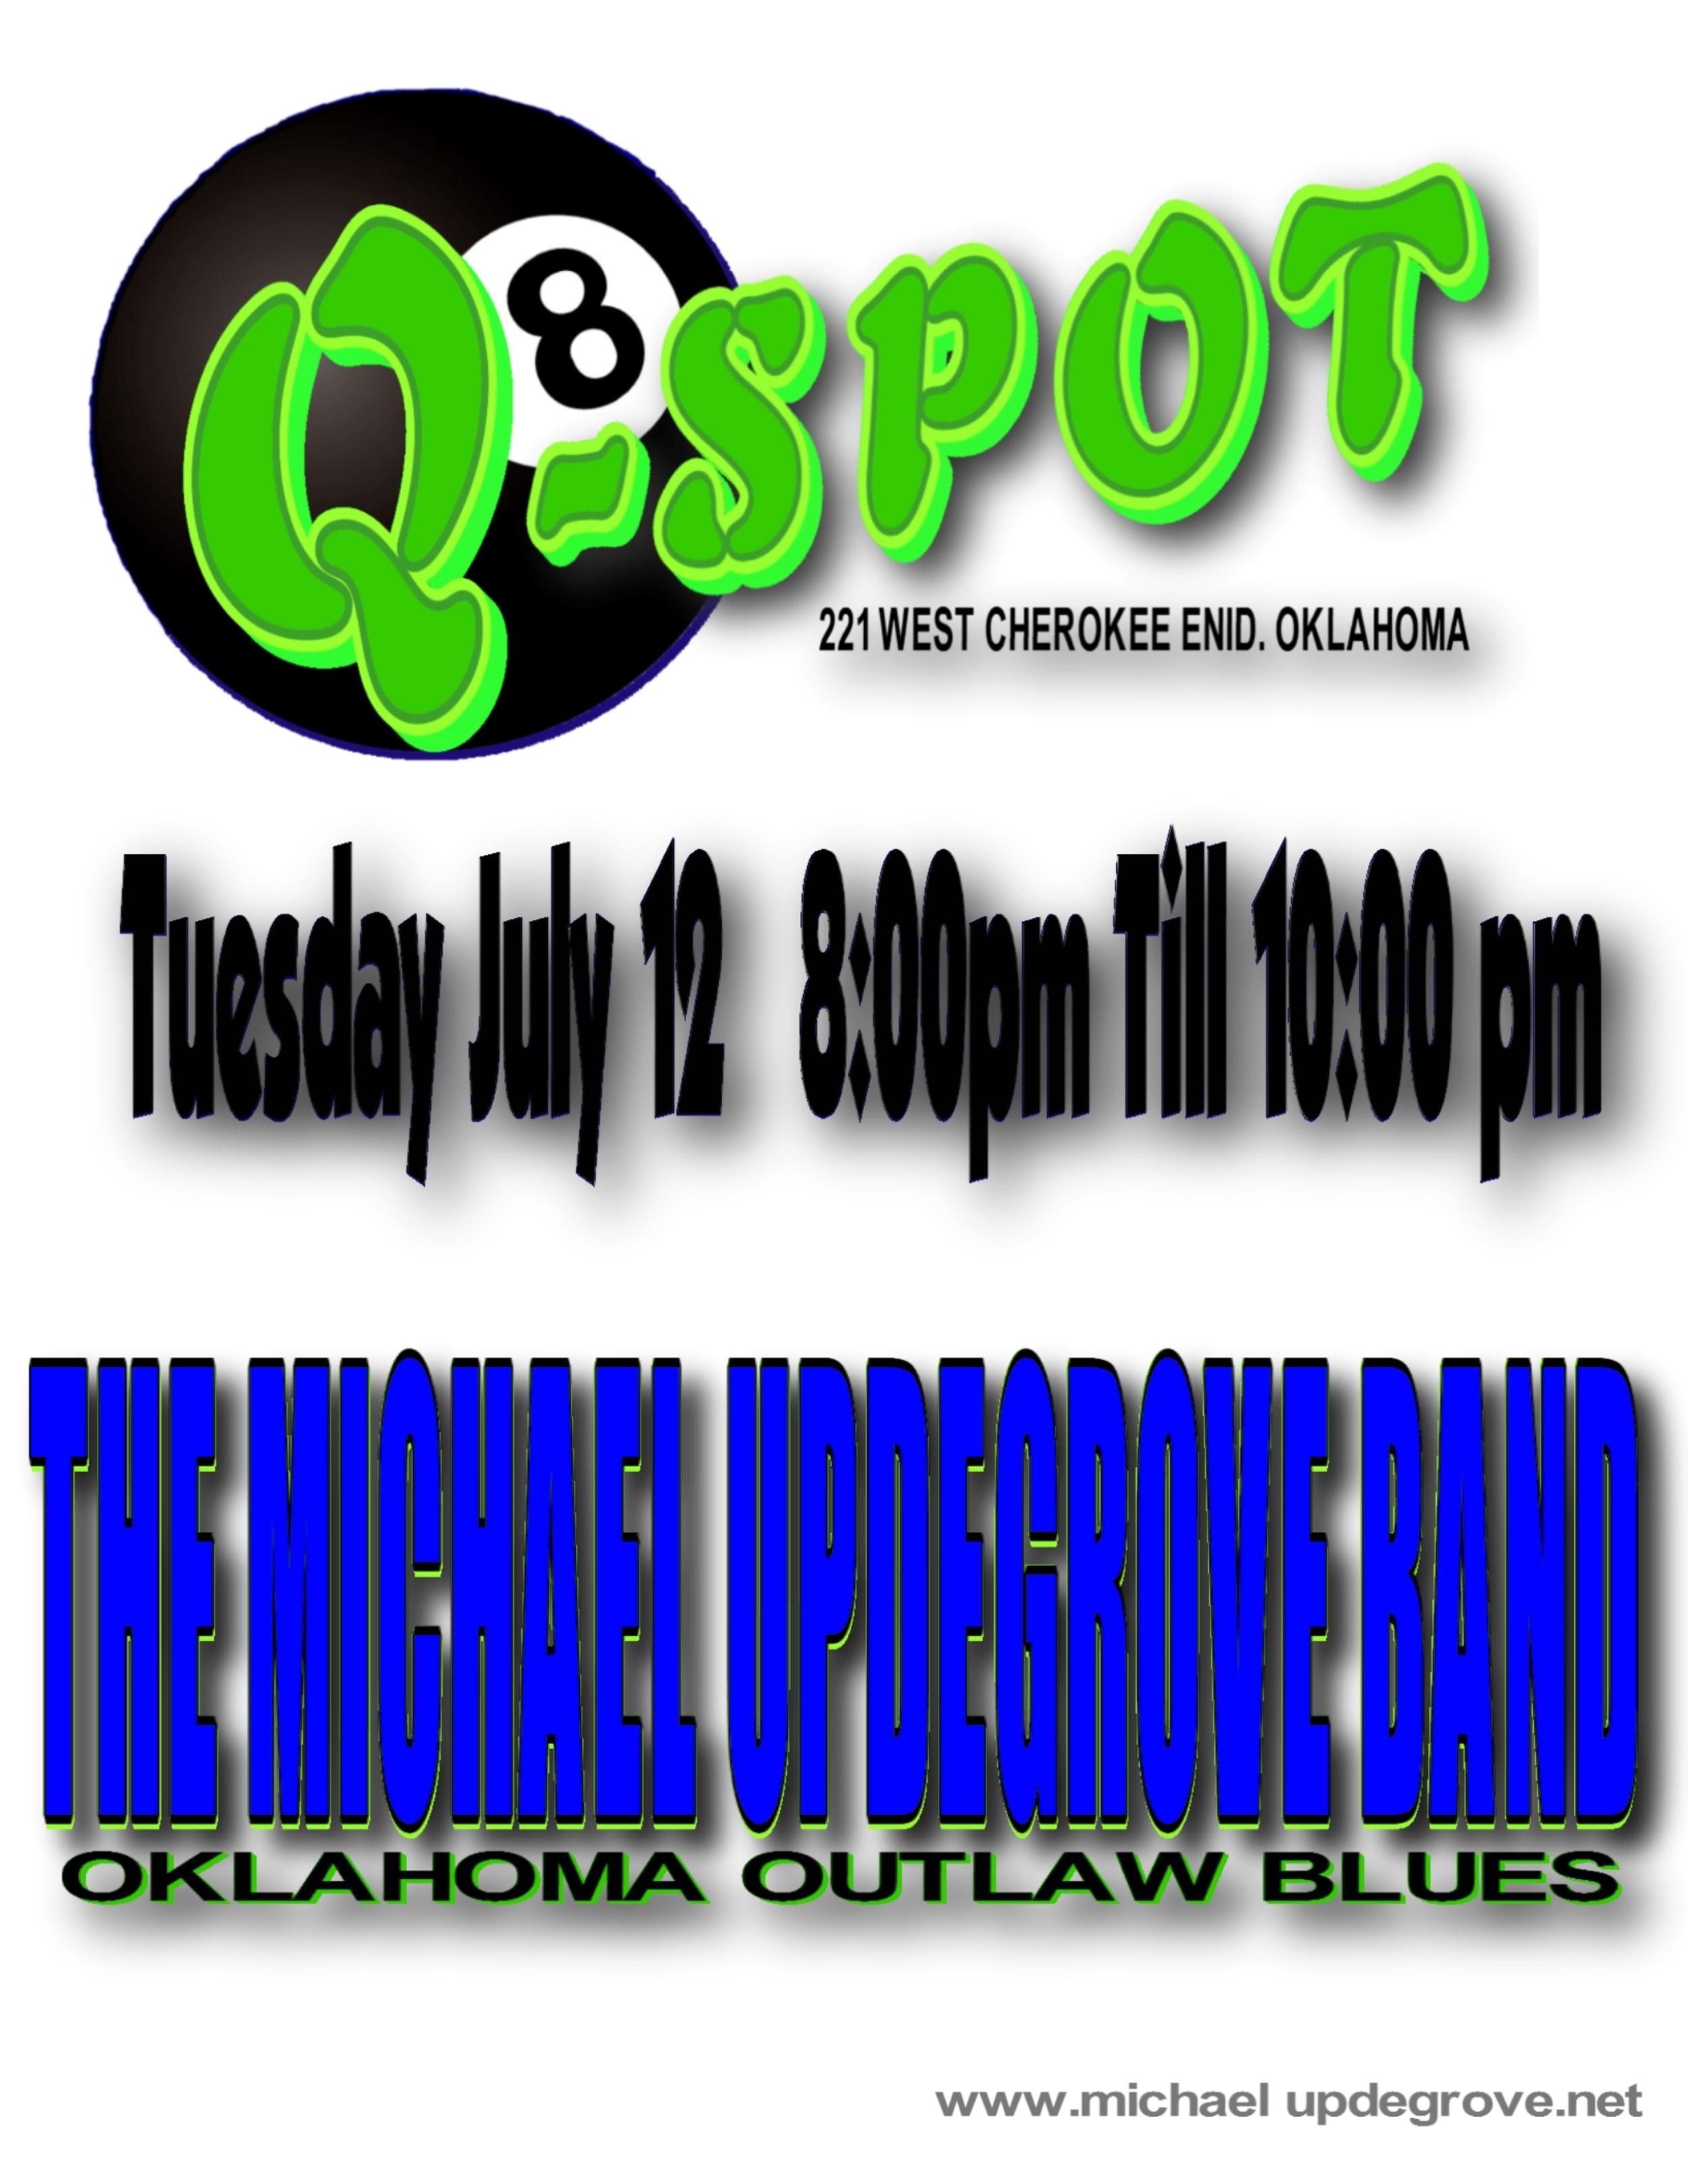 Q-Spot 7-122016.jpg